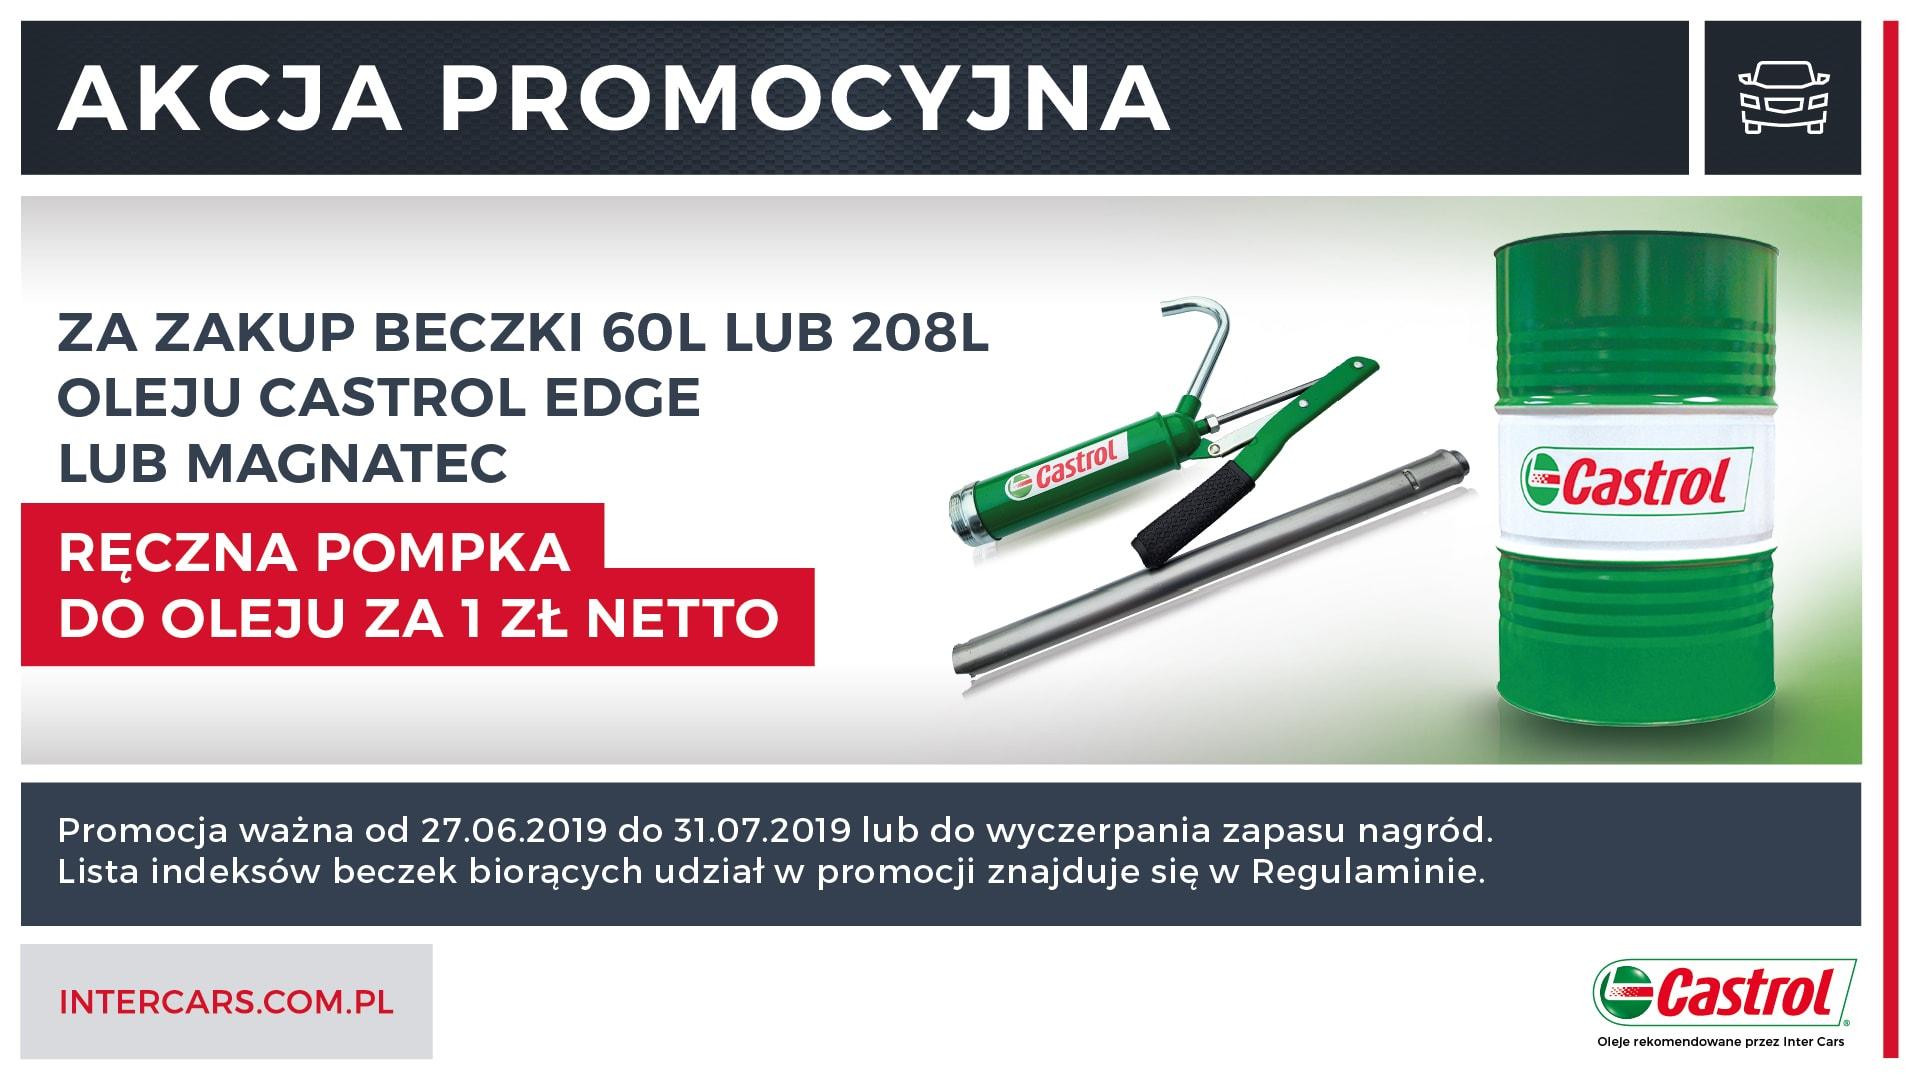 promocja_catrol_za_zakup_beczki_oleju_pompka_za1zl_1920x1080_newsletter-min.jpg